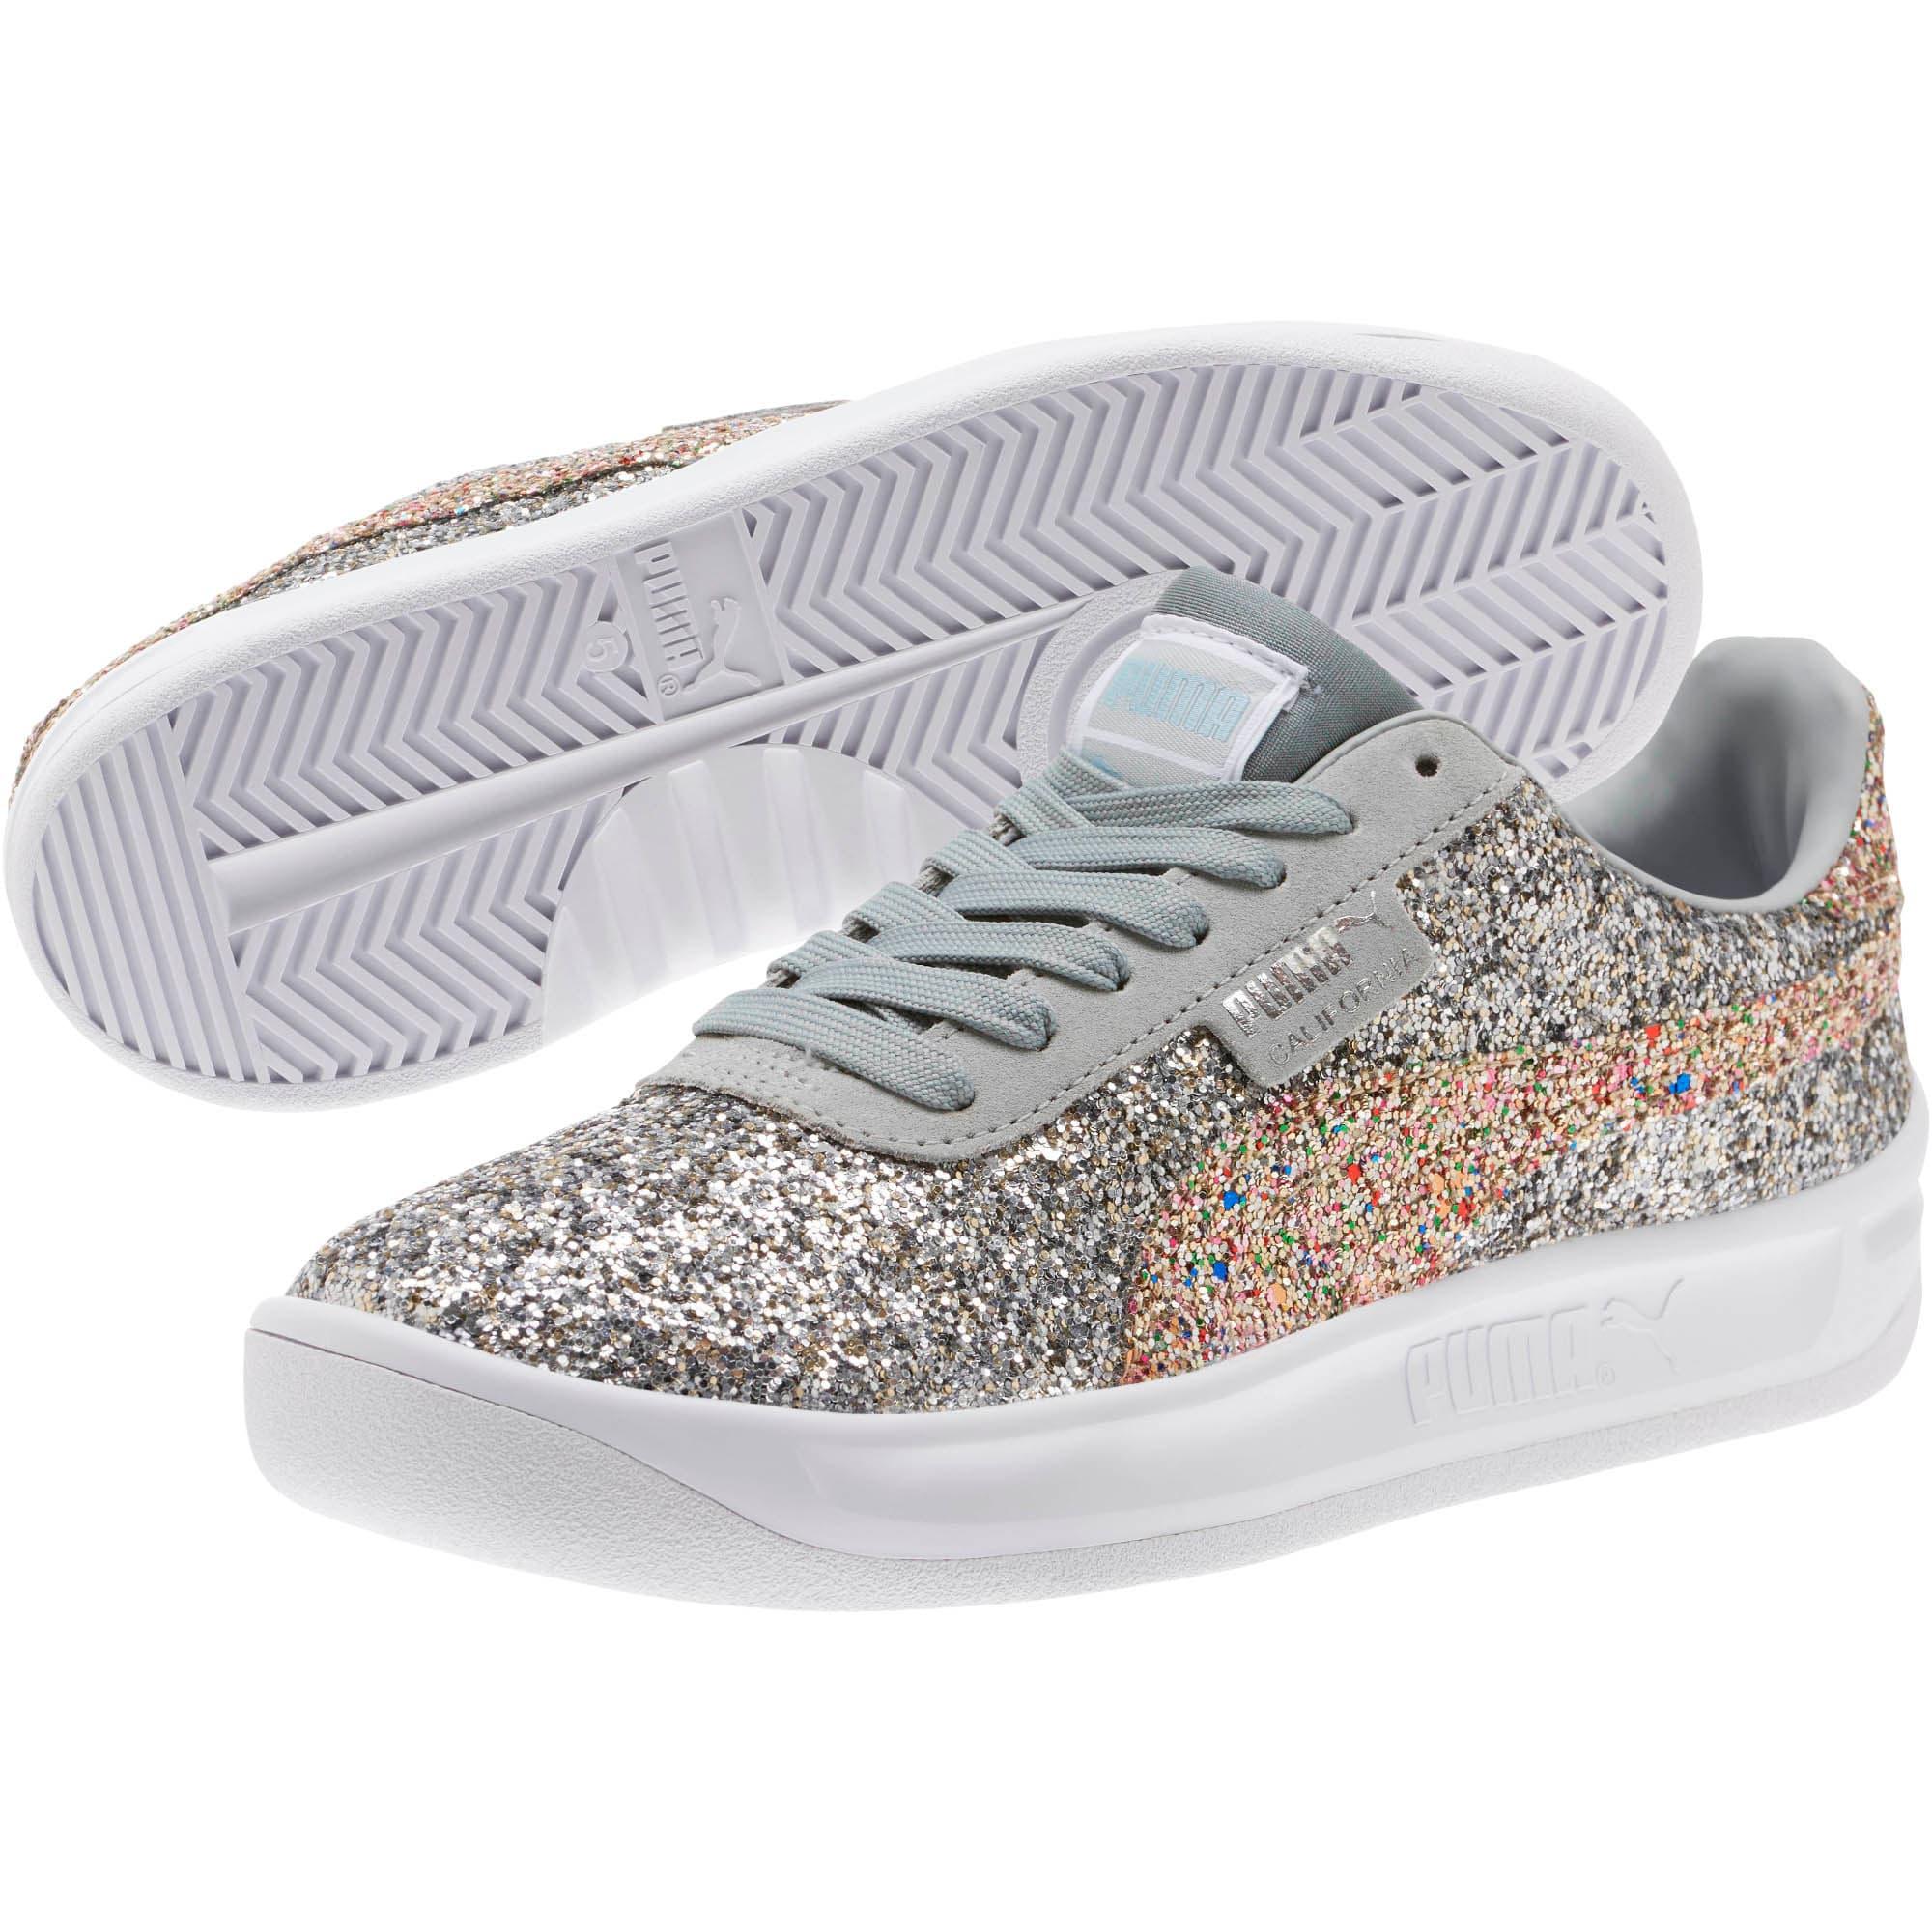 Thumbnail 2 of California Glitz Women's Sneakers, Silver-CERULEAN-Quarry, medium